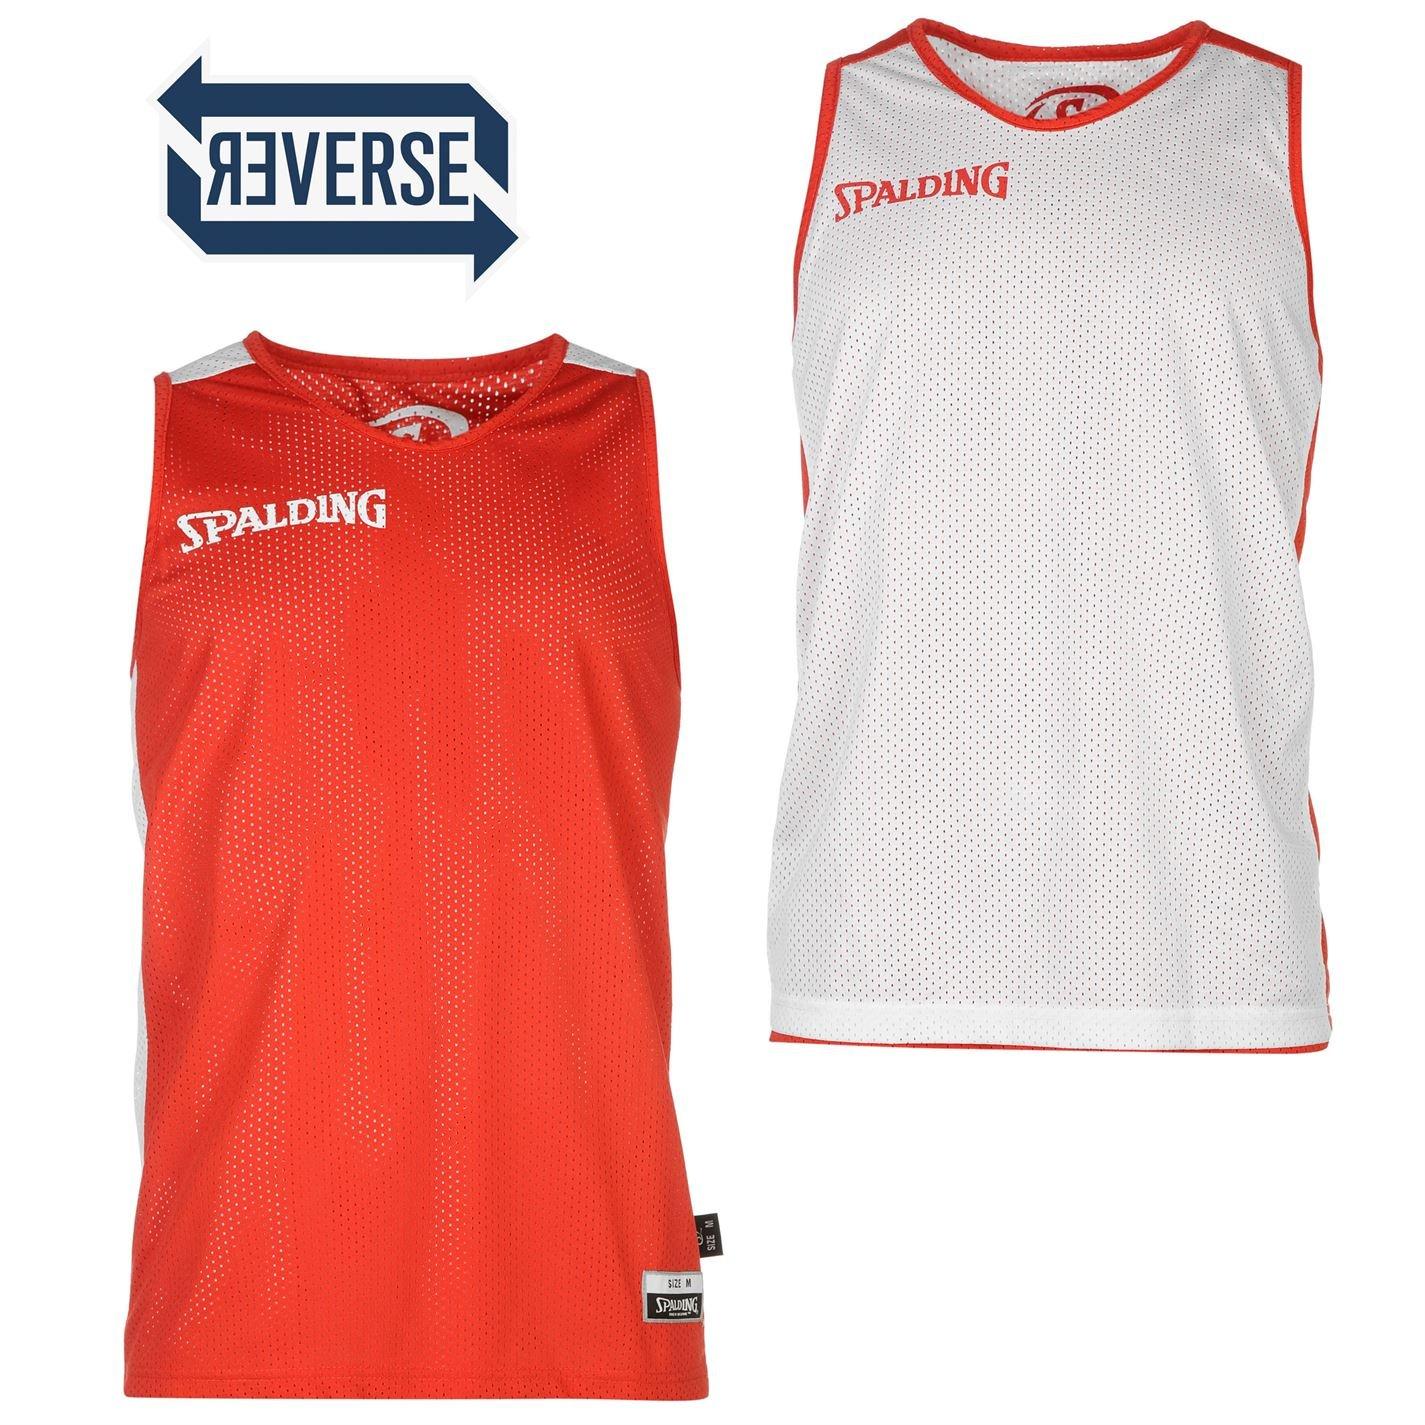 Spalding Hombre Reversible Camiseta Ligero Baloncesto Sin Mangas ...